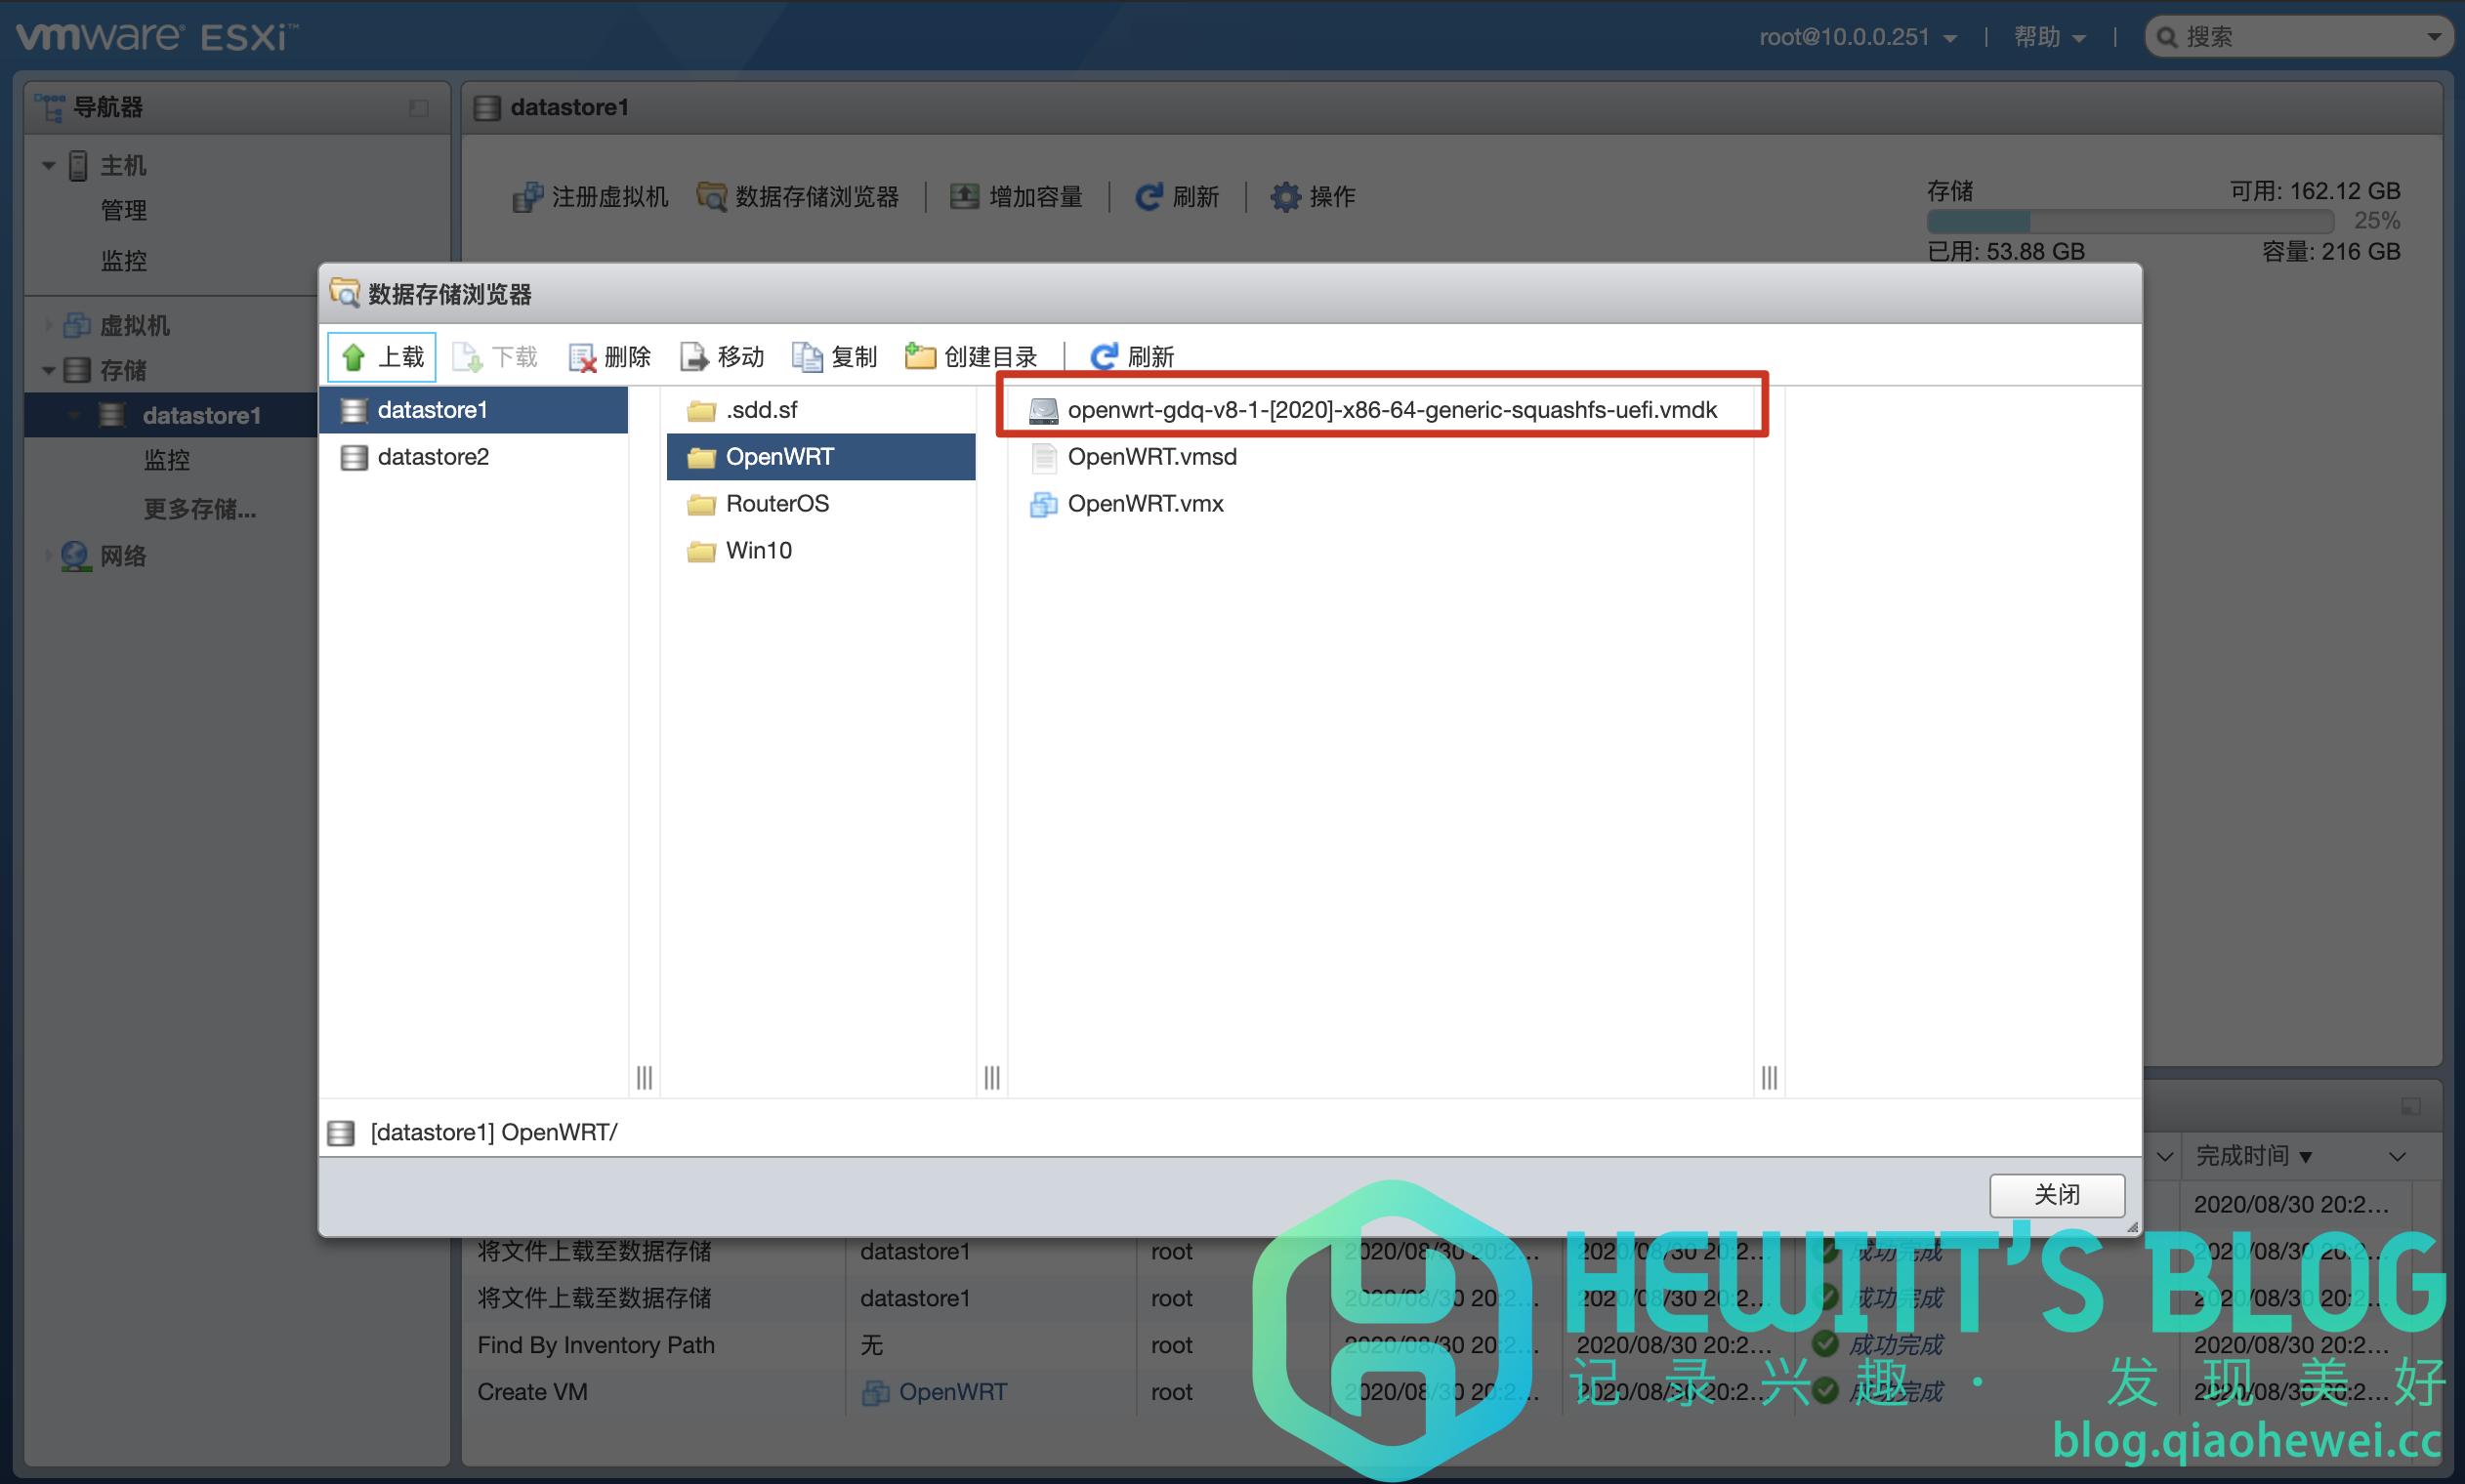 ESXI安装OpenWRT & LEDE软路由部署指南(附镜像下载)插图13